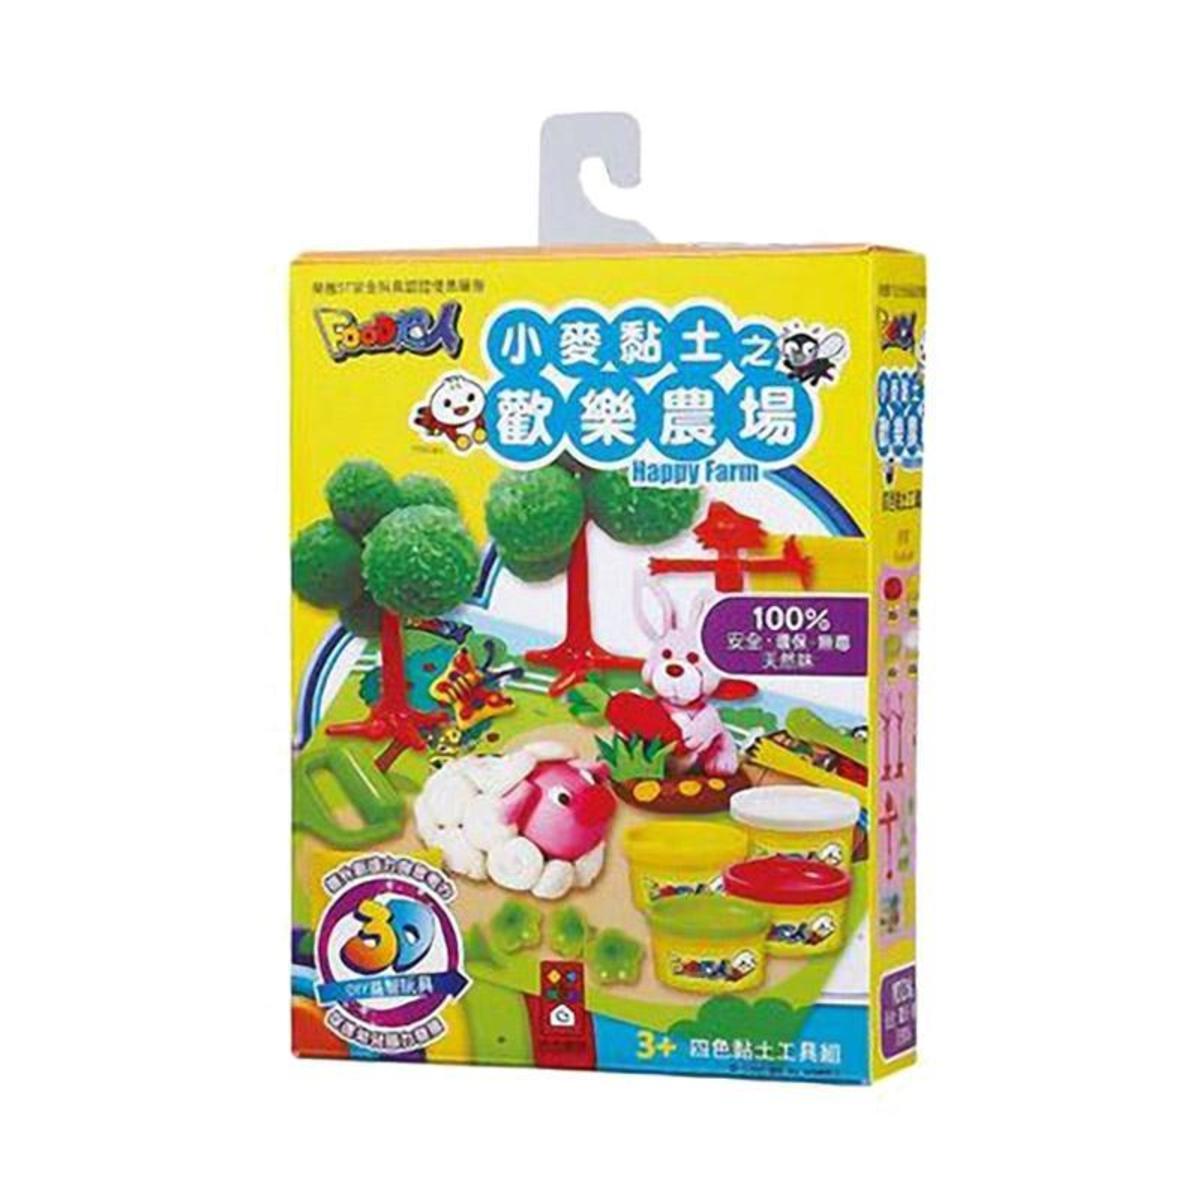 Publishing FOOD Superman Wheat Clay (4 models) Taiwan Import - Happy farm